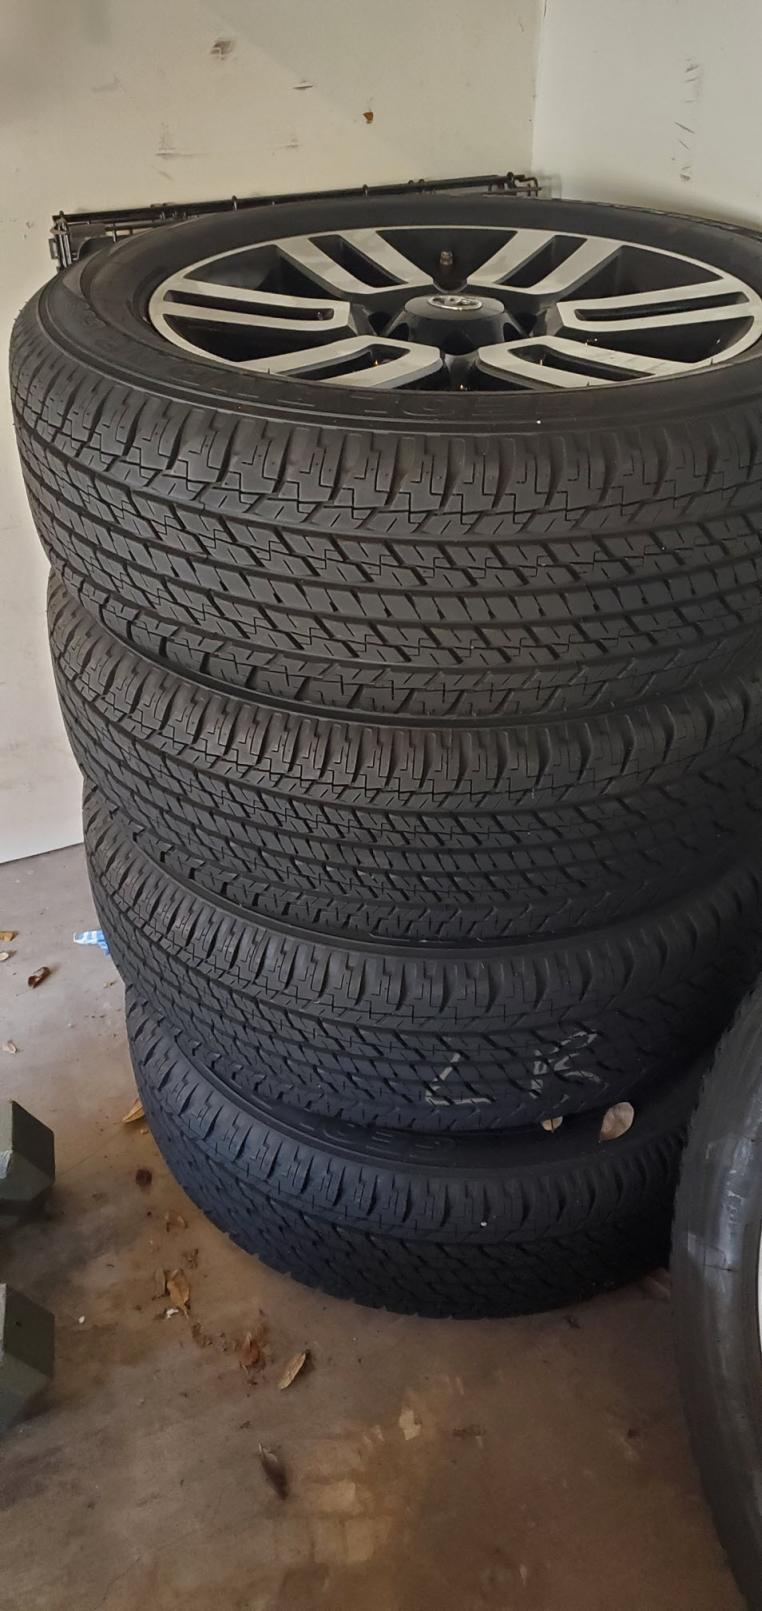 "5th Gen Limitied 4Runner 5 20"" wheels+tires Houston Tx 00-20210829_084159-jpg"